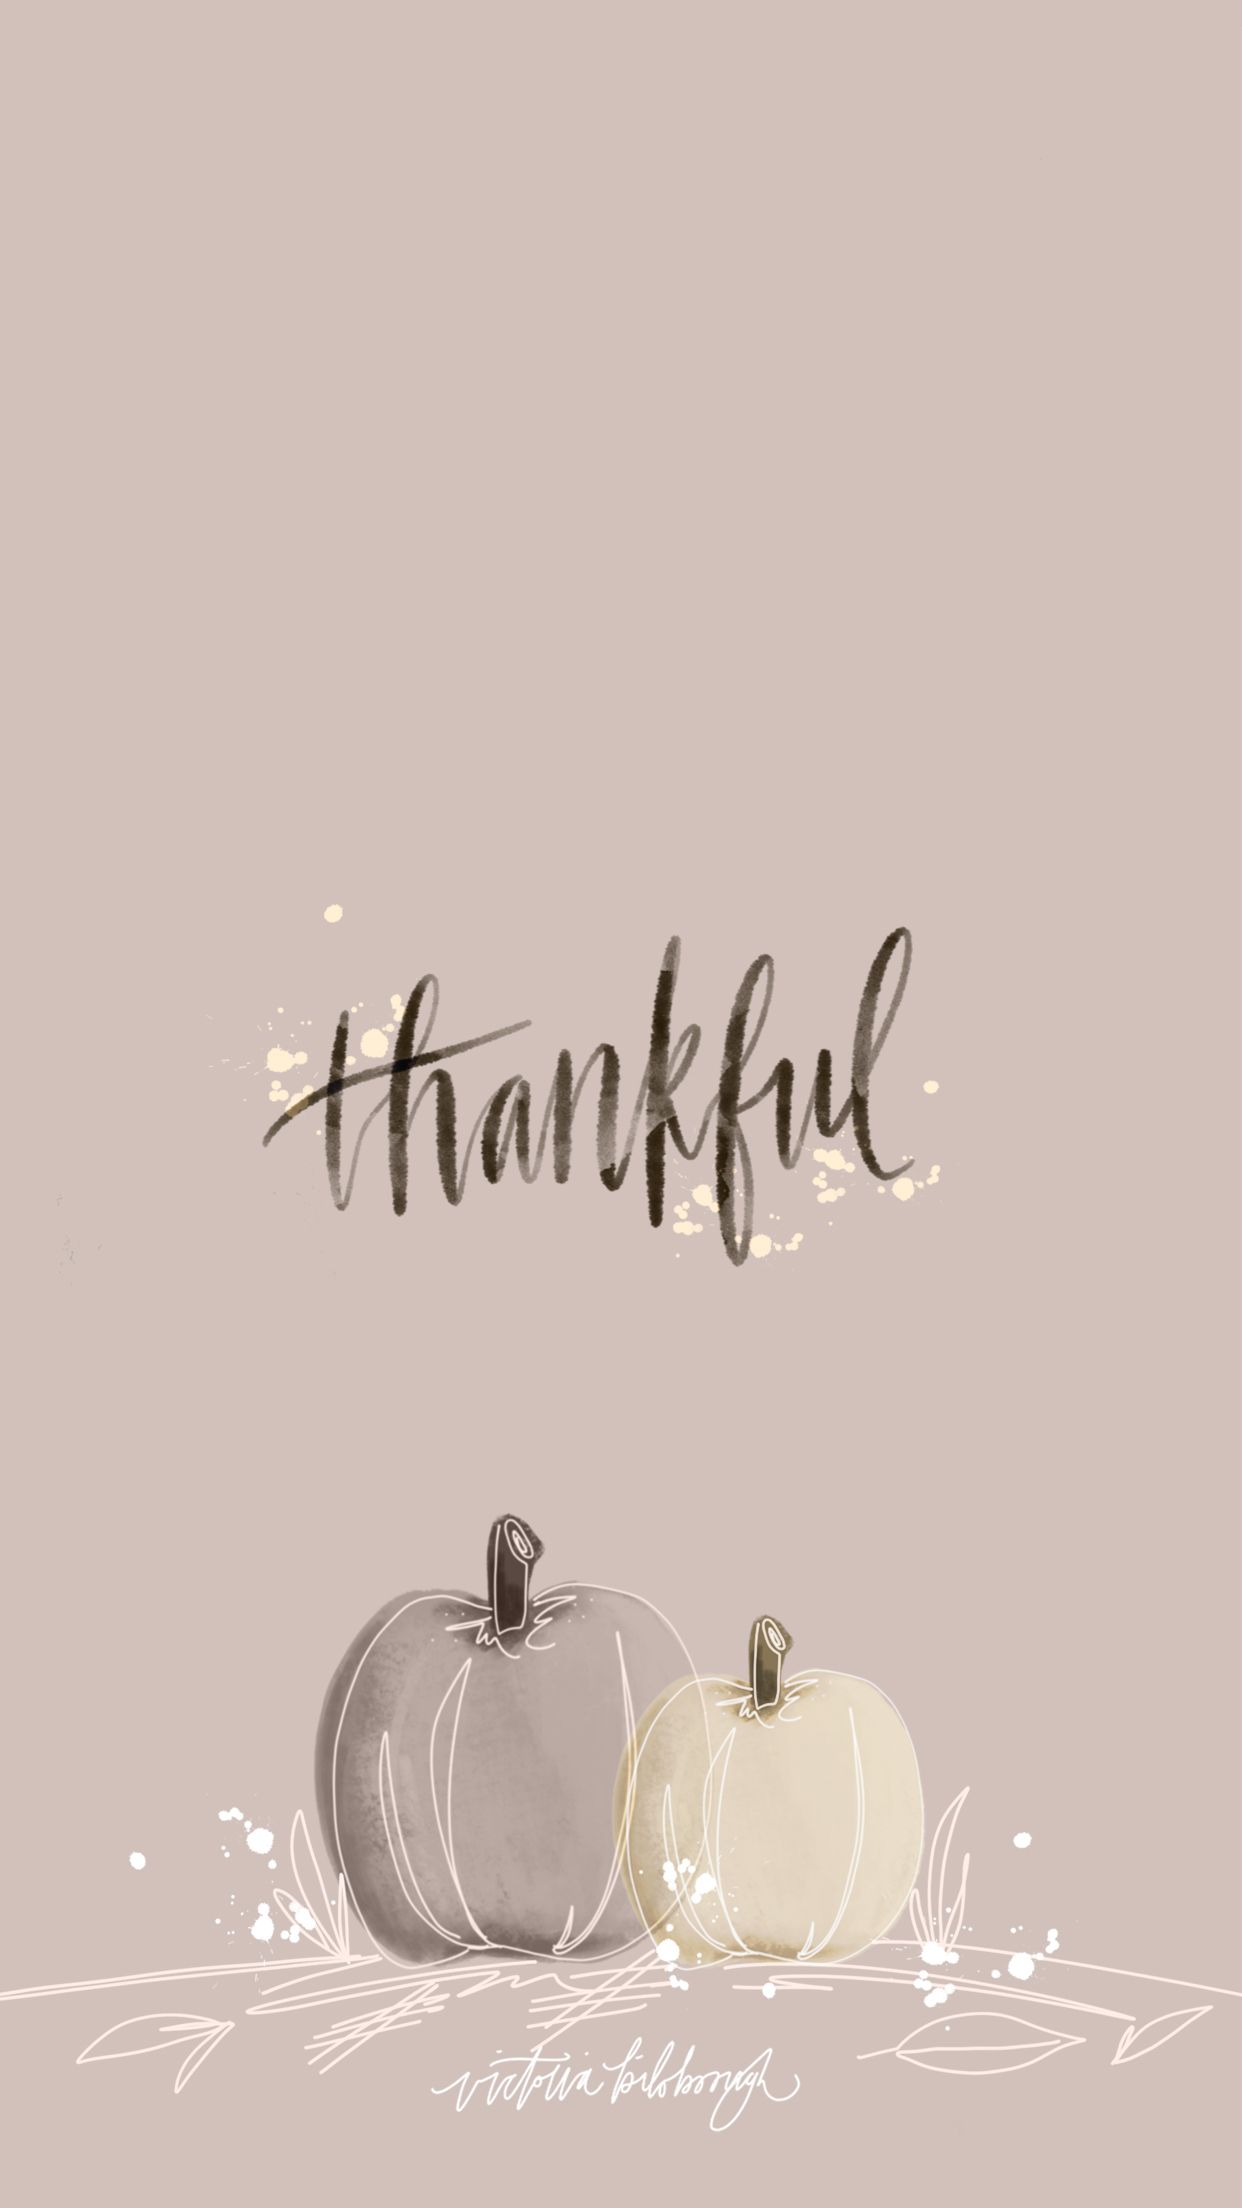 November Thanksgiving Wallpapers Phone Laptop Iphone 1242x2208